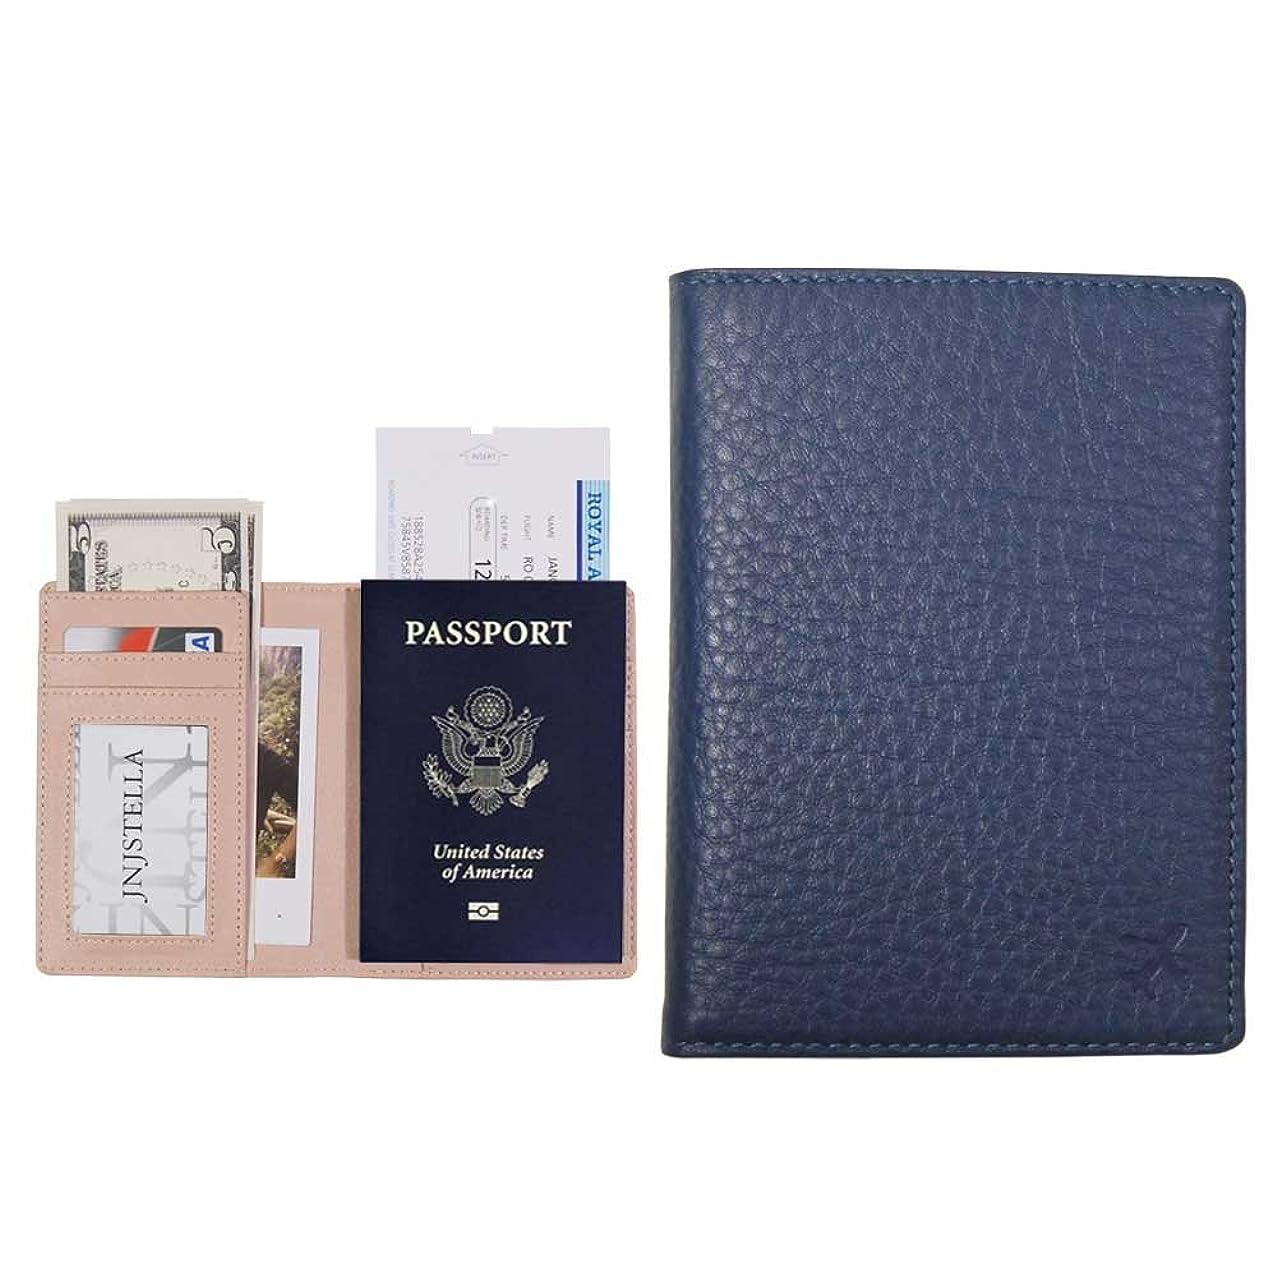 Jnjstella Genuine Leather RFID Blocking Passport Compact Case No Skimming Wallet